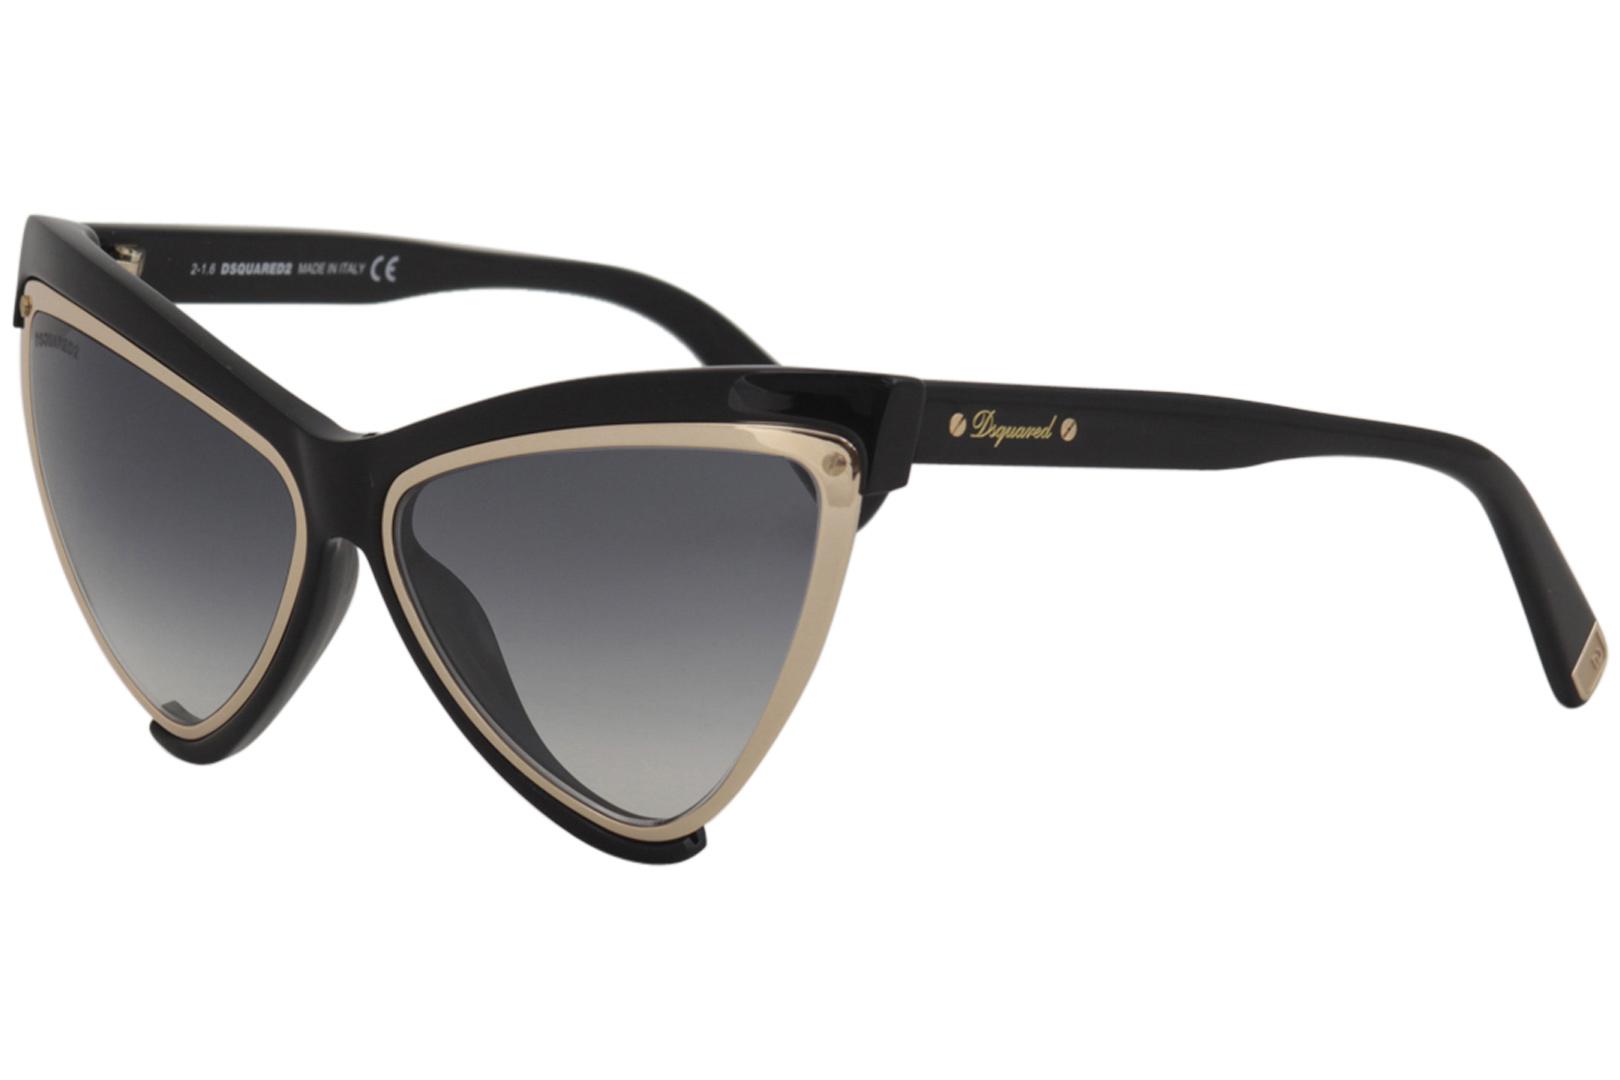 d93c39bef7d Dsquared2 Women s DQ0240 DQ 0240 01B Black Fashion Cateye Sunglasses ...